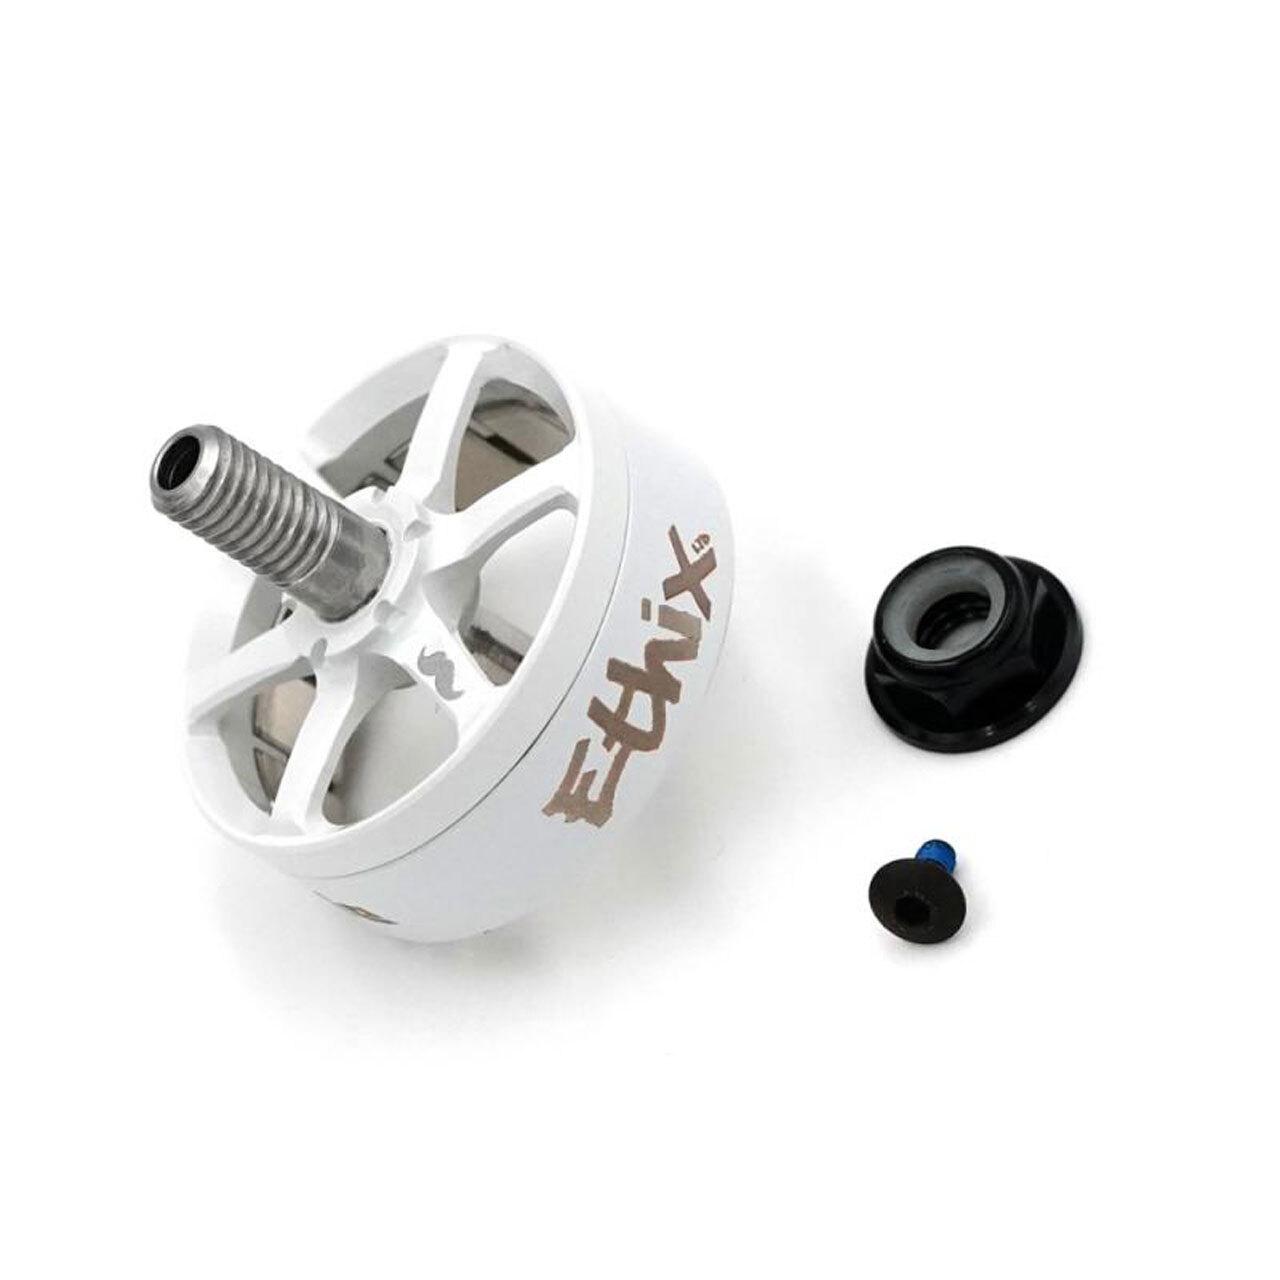 ETHIX MR STEELE SILK V3 SPARE BELL